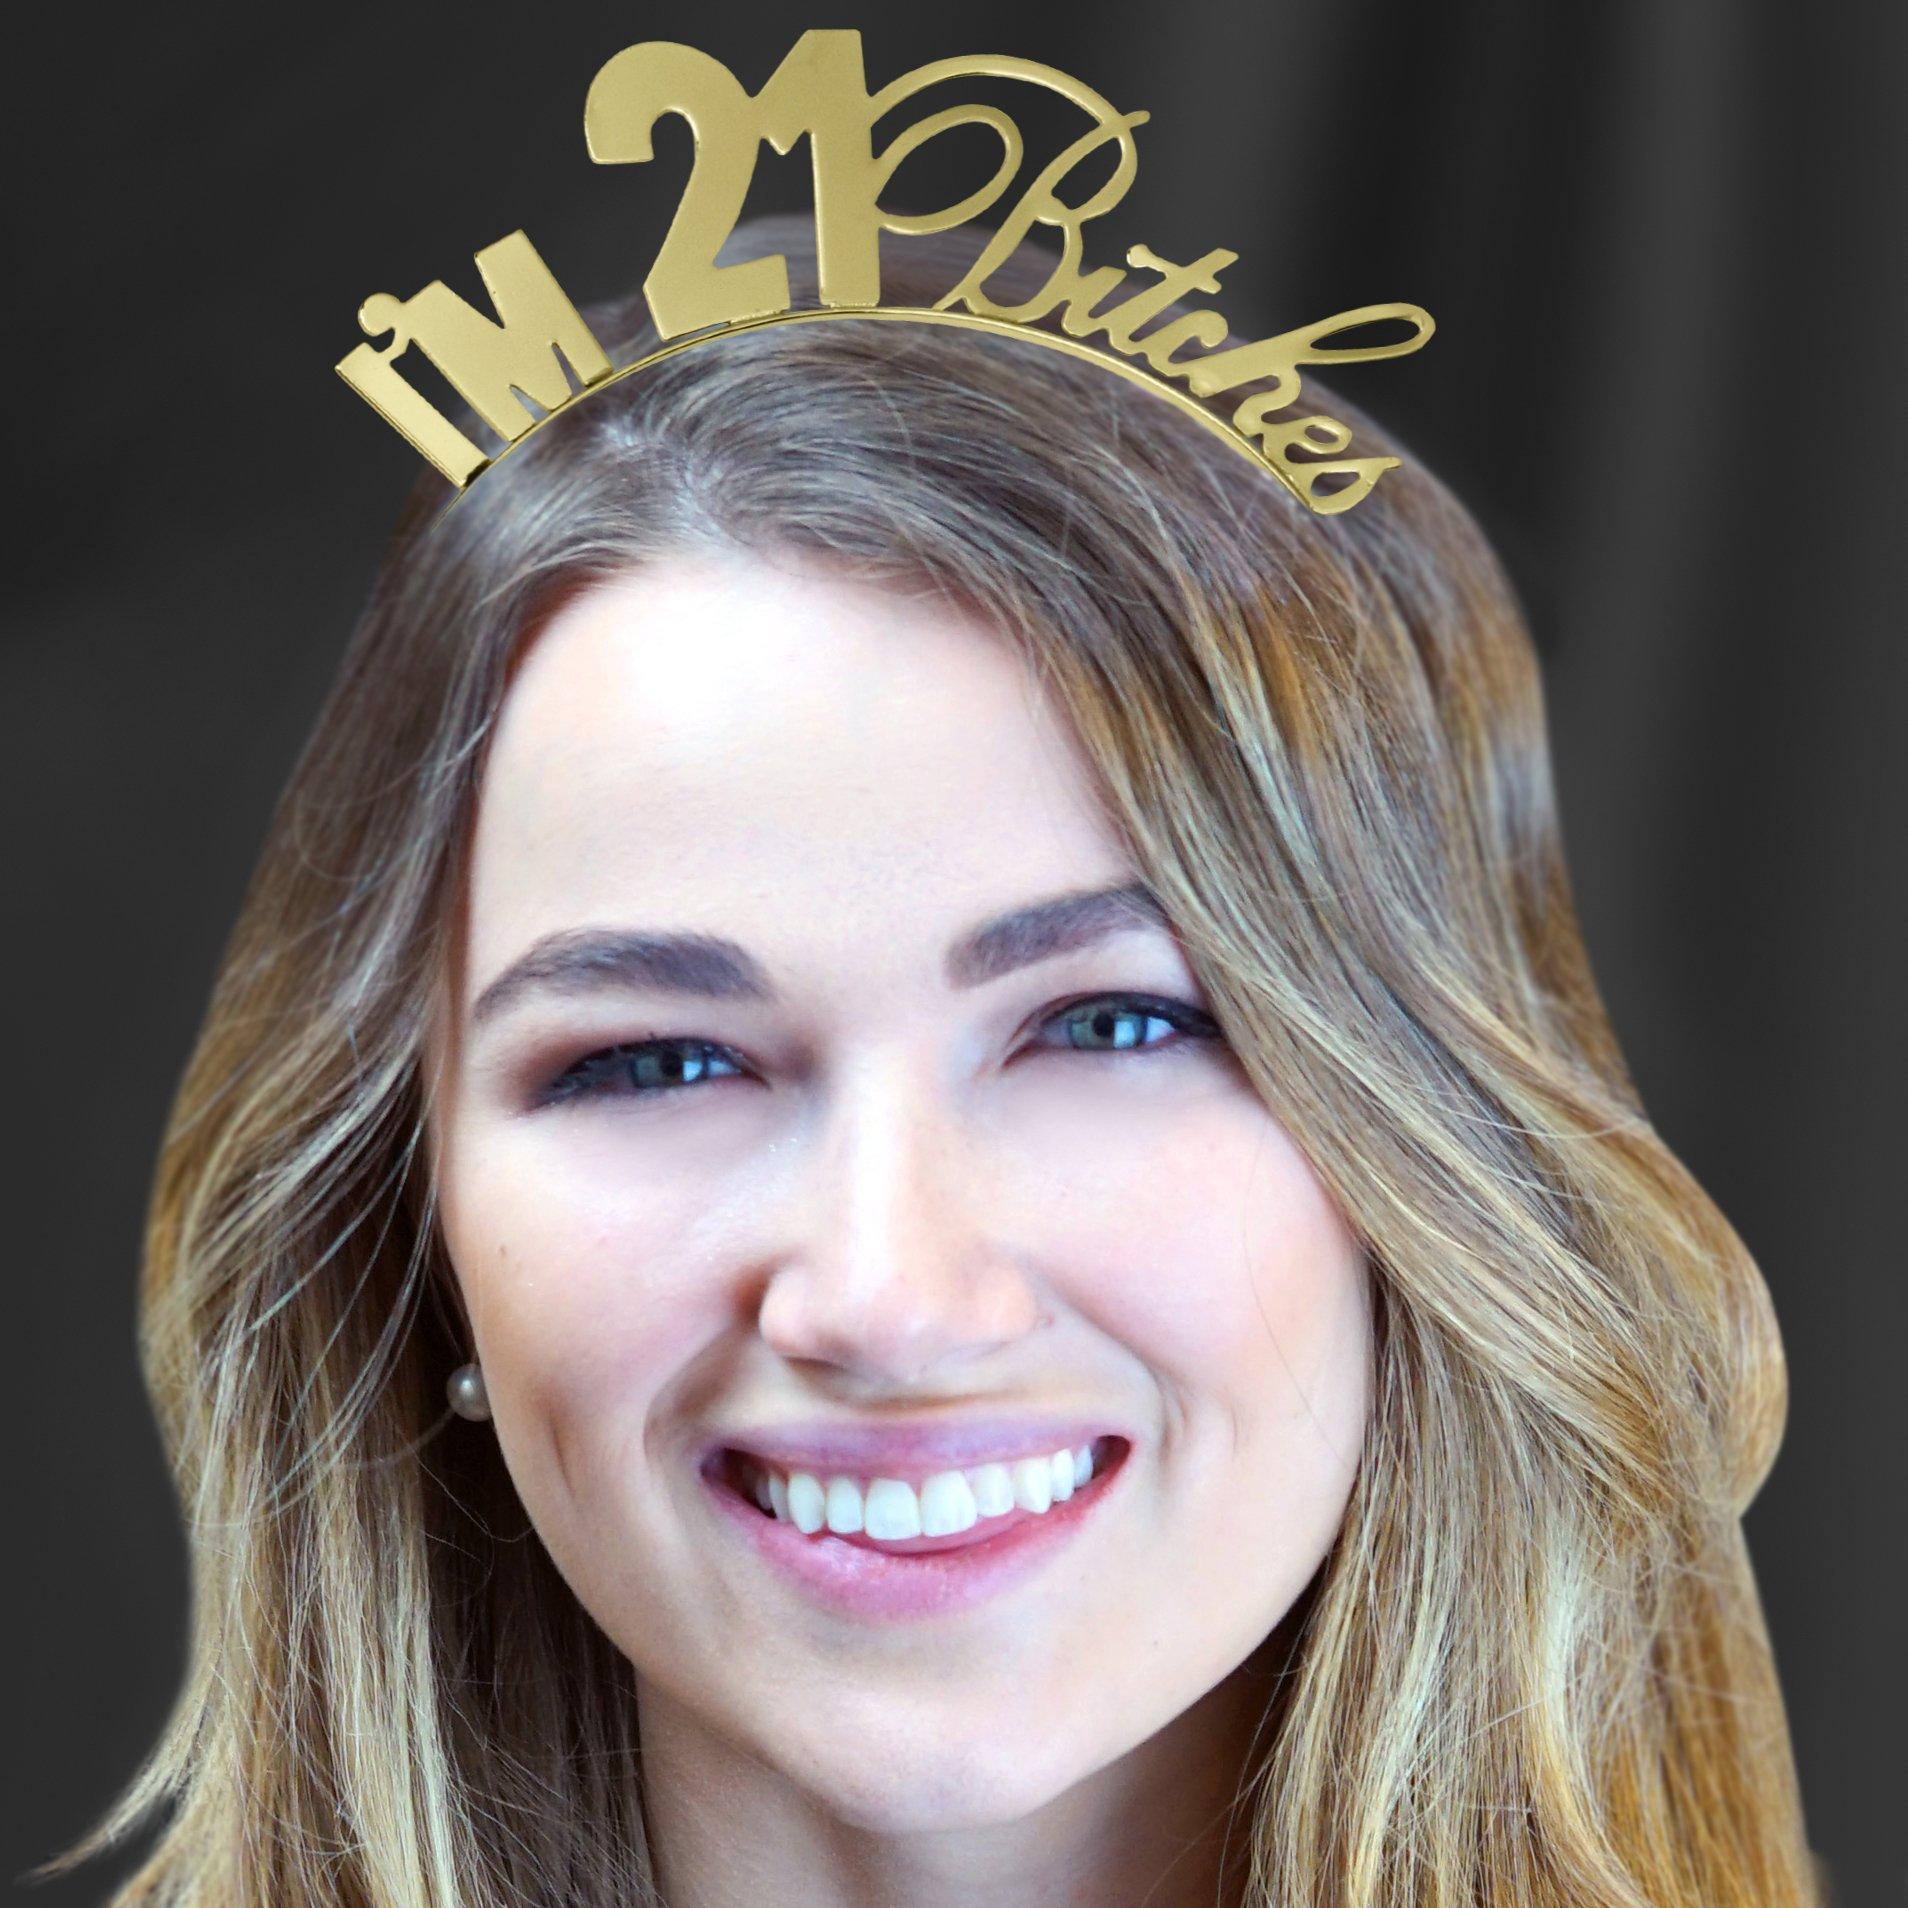 I'm 21 Bitches Rhinestone Gold Satin Sash & Gold Headband Tiara - 21st Birthday Gift Set Supplies – Gold by RhinestoneSash (Image #2)